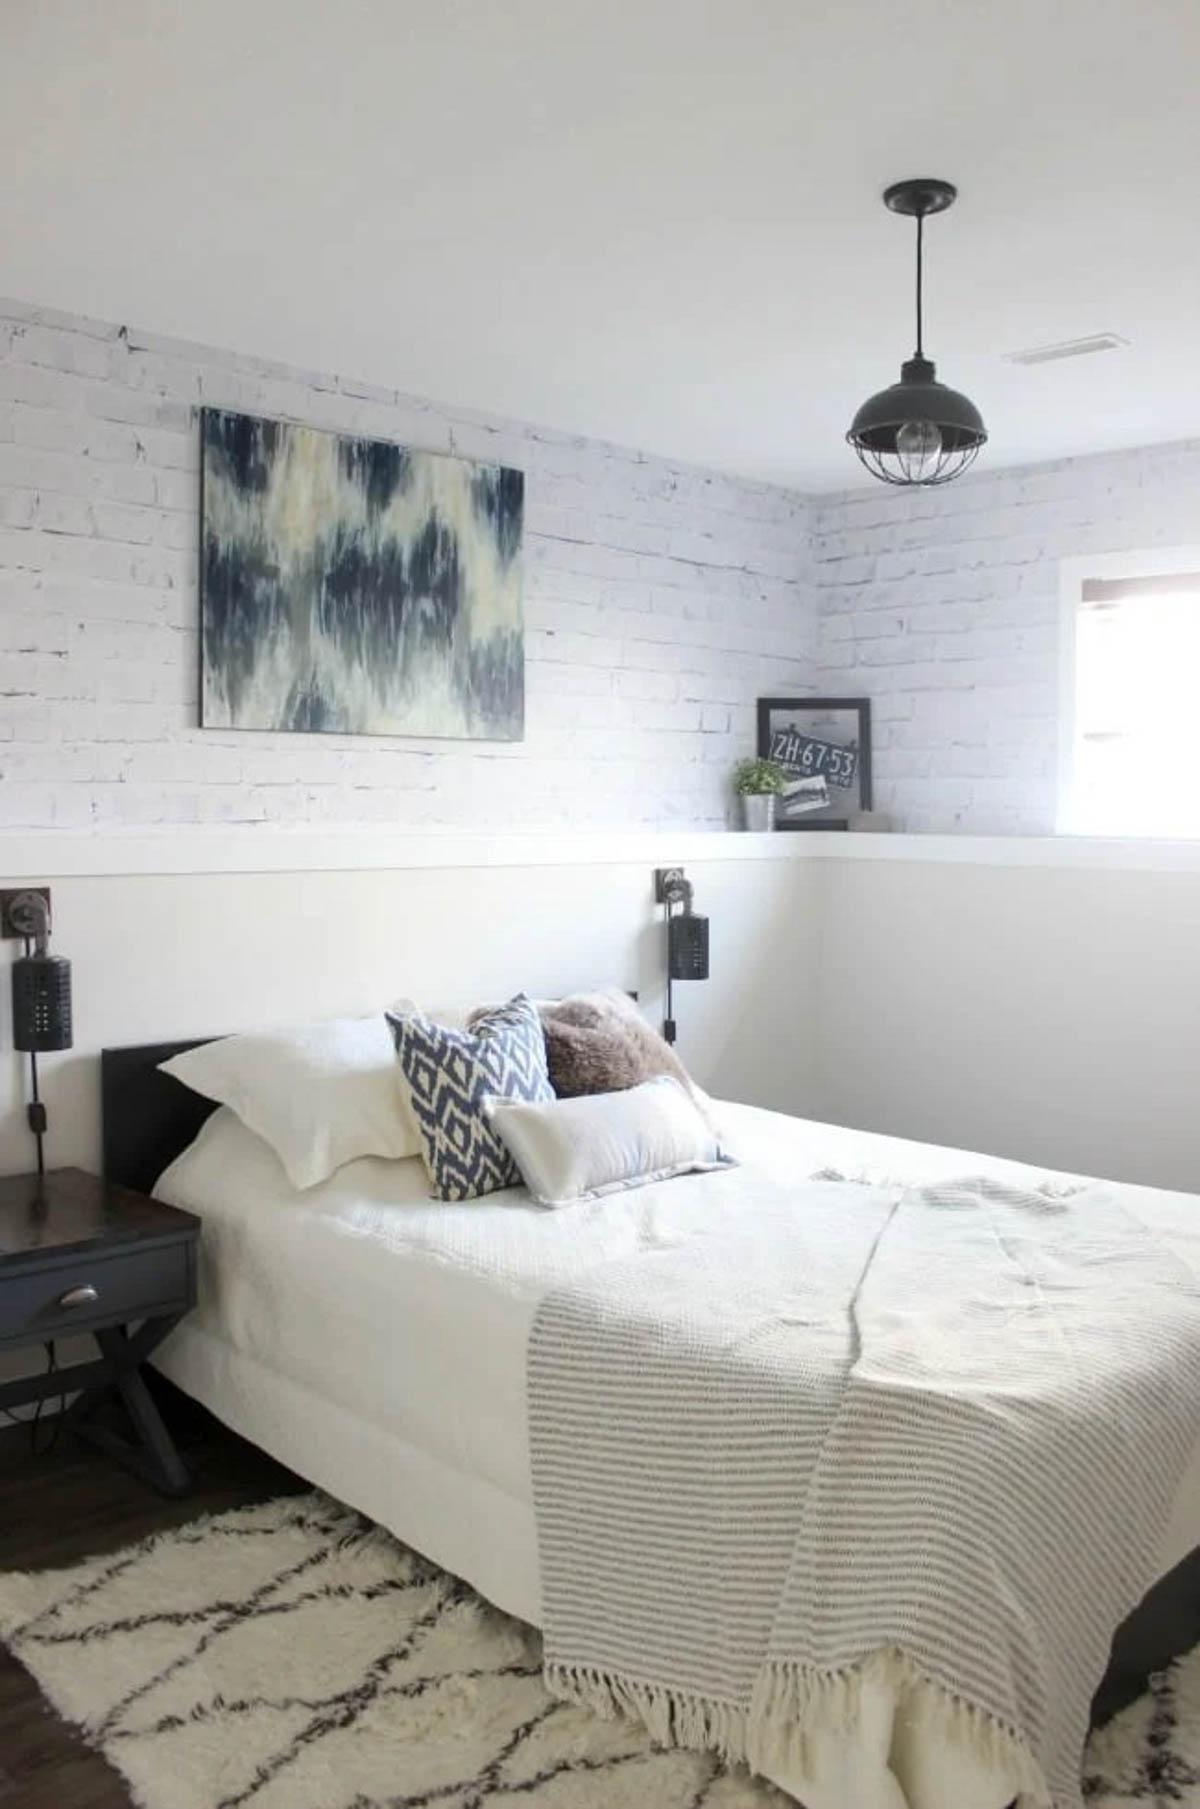 Image of an industrial designed bedroom